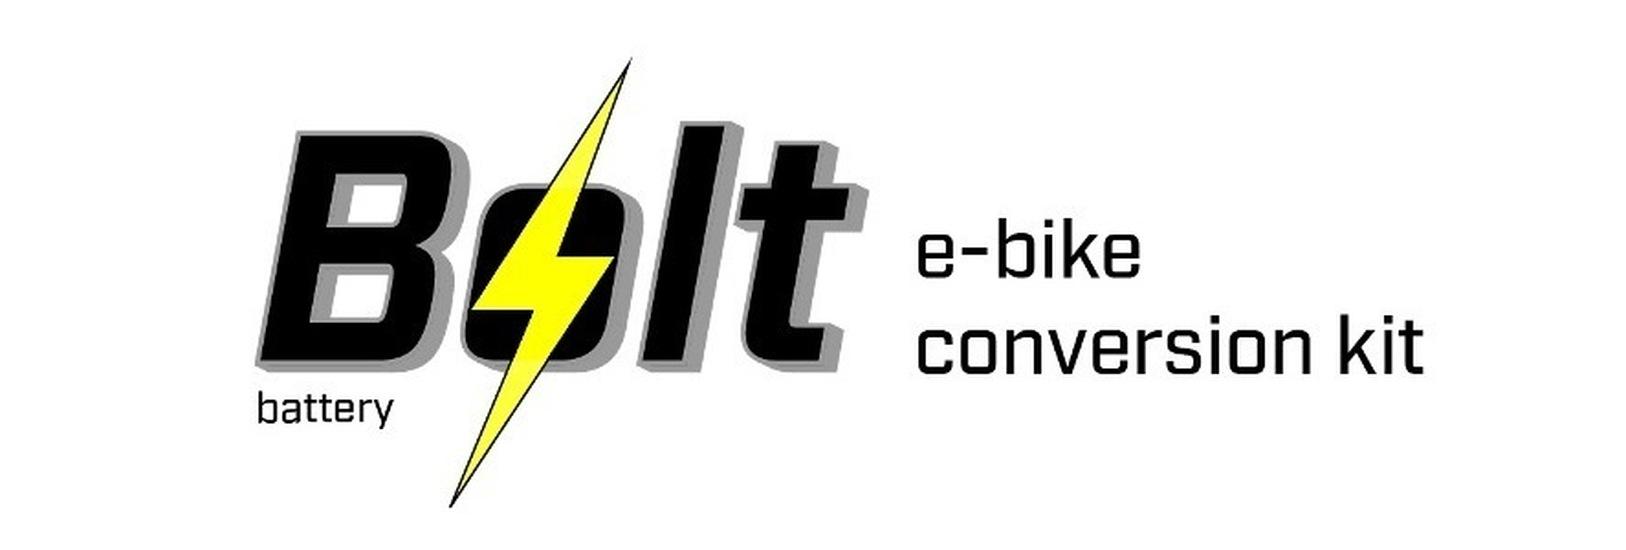 zestawy do konwersji roweru Bolt